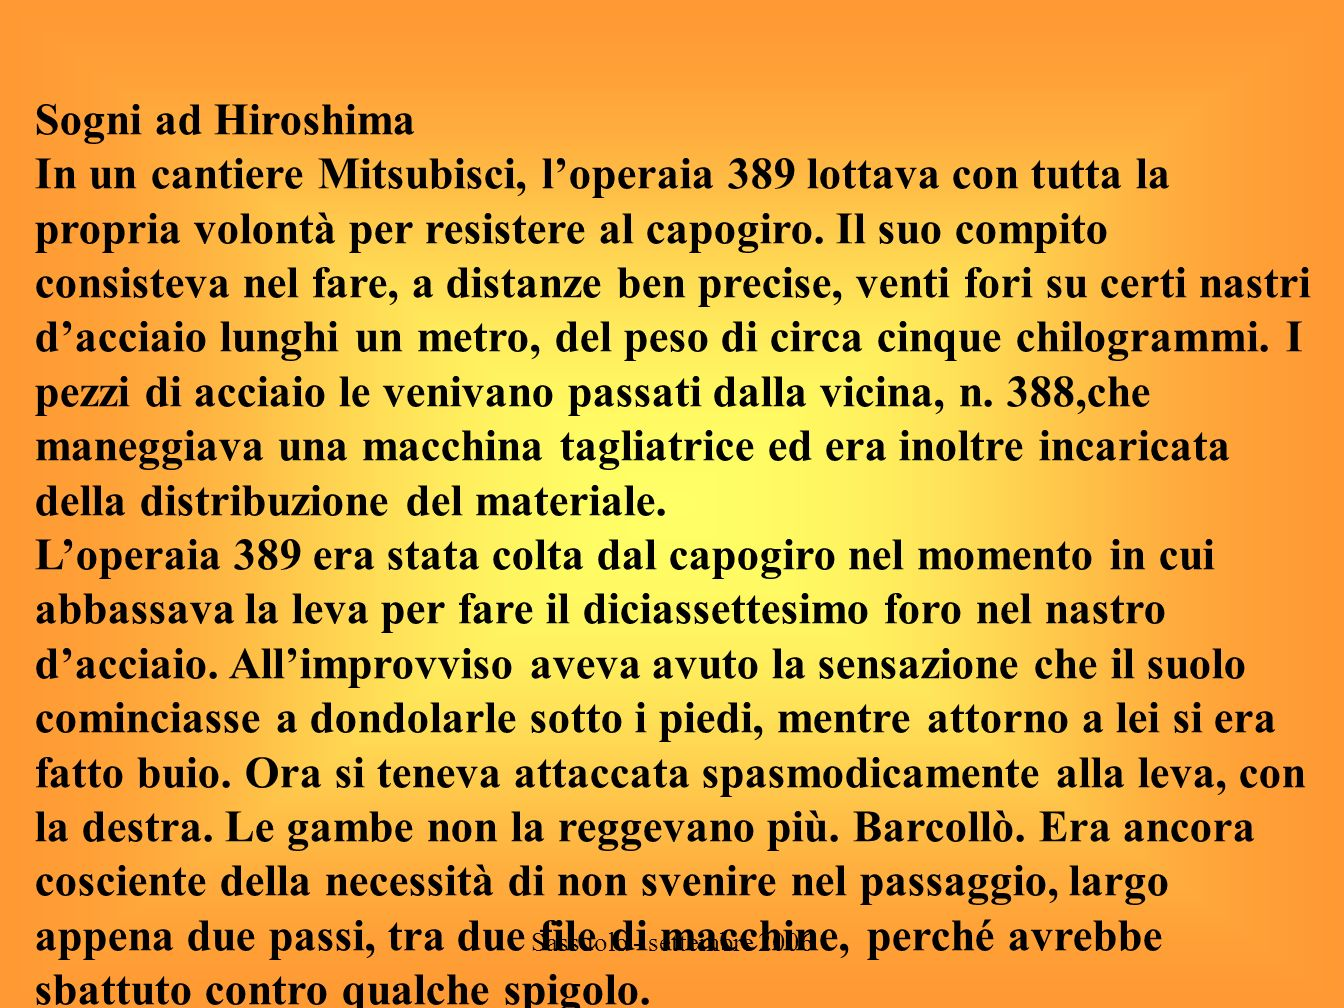 Sogni ad Hiroshima